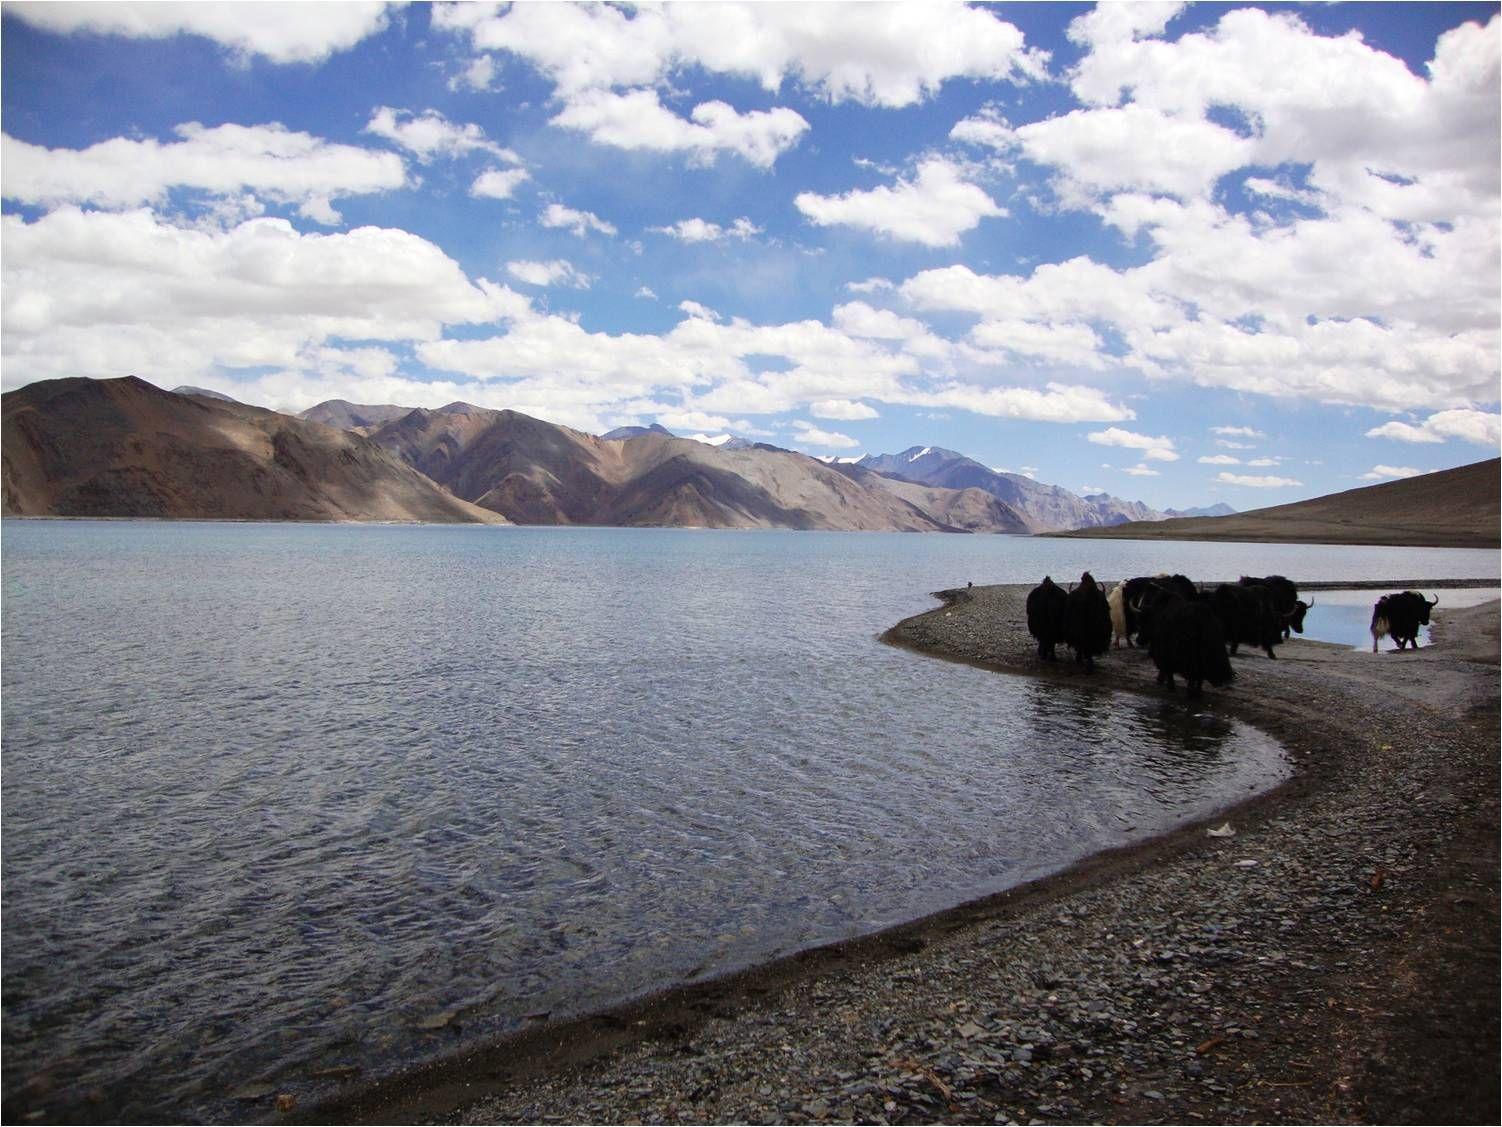 Shepherds and yaks by the Pangong Lake